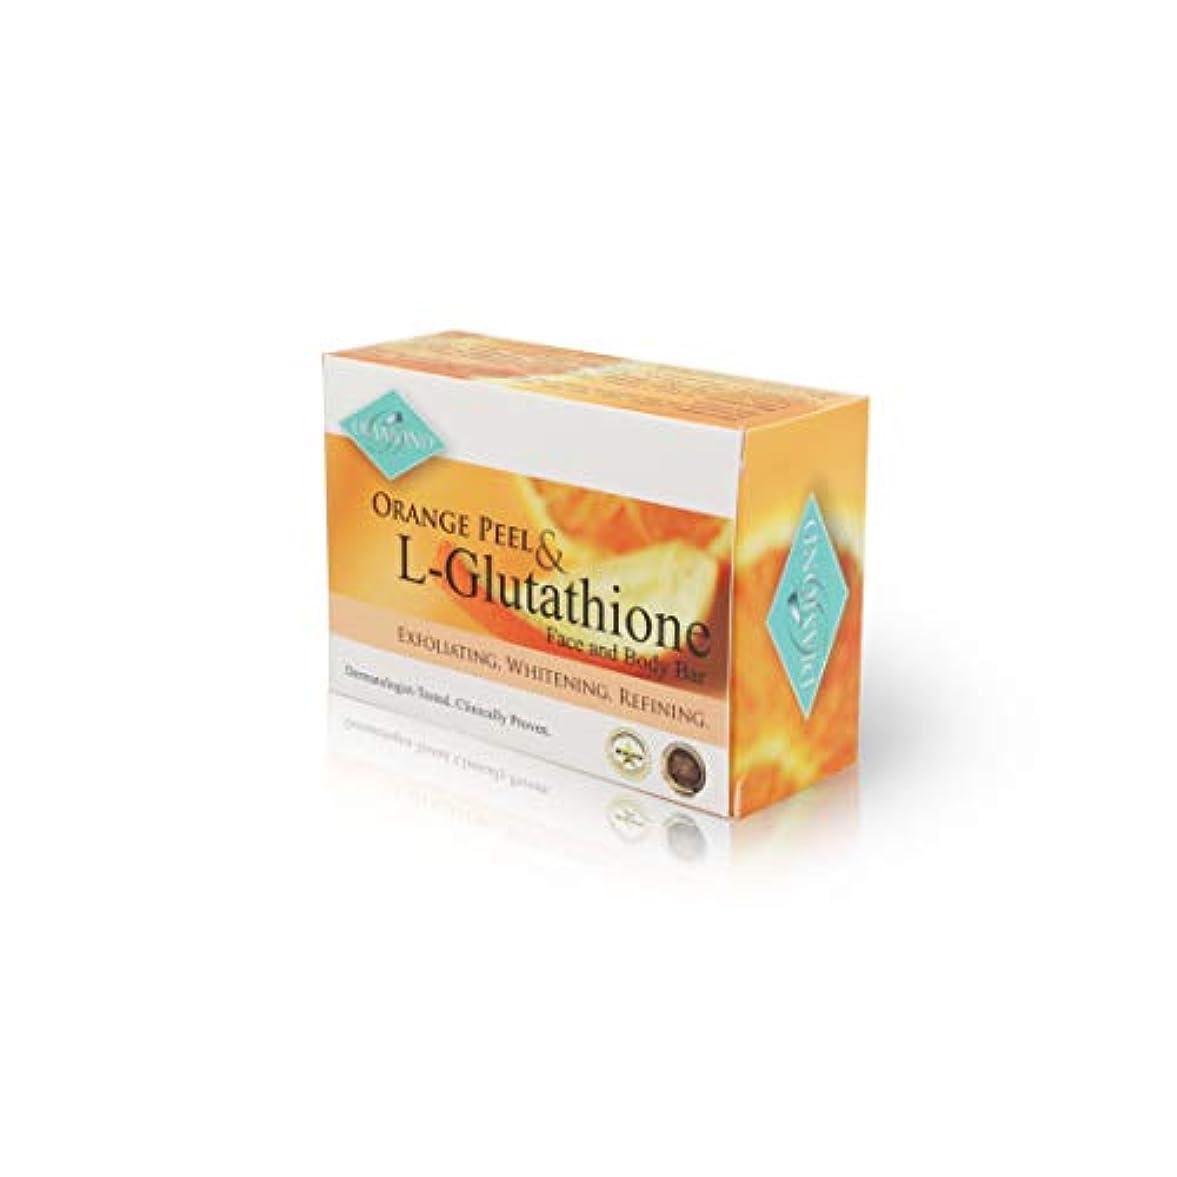 DIAMOND ORANGE PEEL&Glutathione soap/オレンジピール&グルタチオン配合ソープ(美容石けん) 150g 正規輸入品